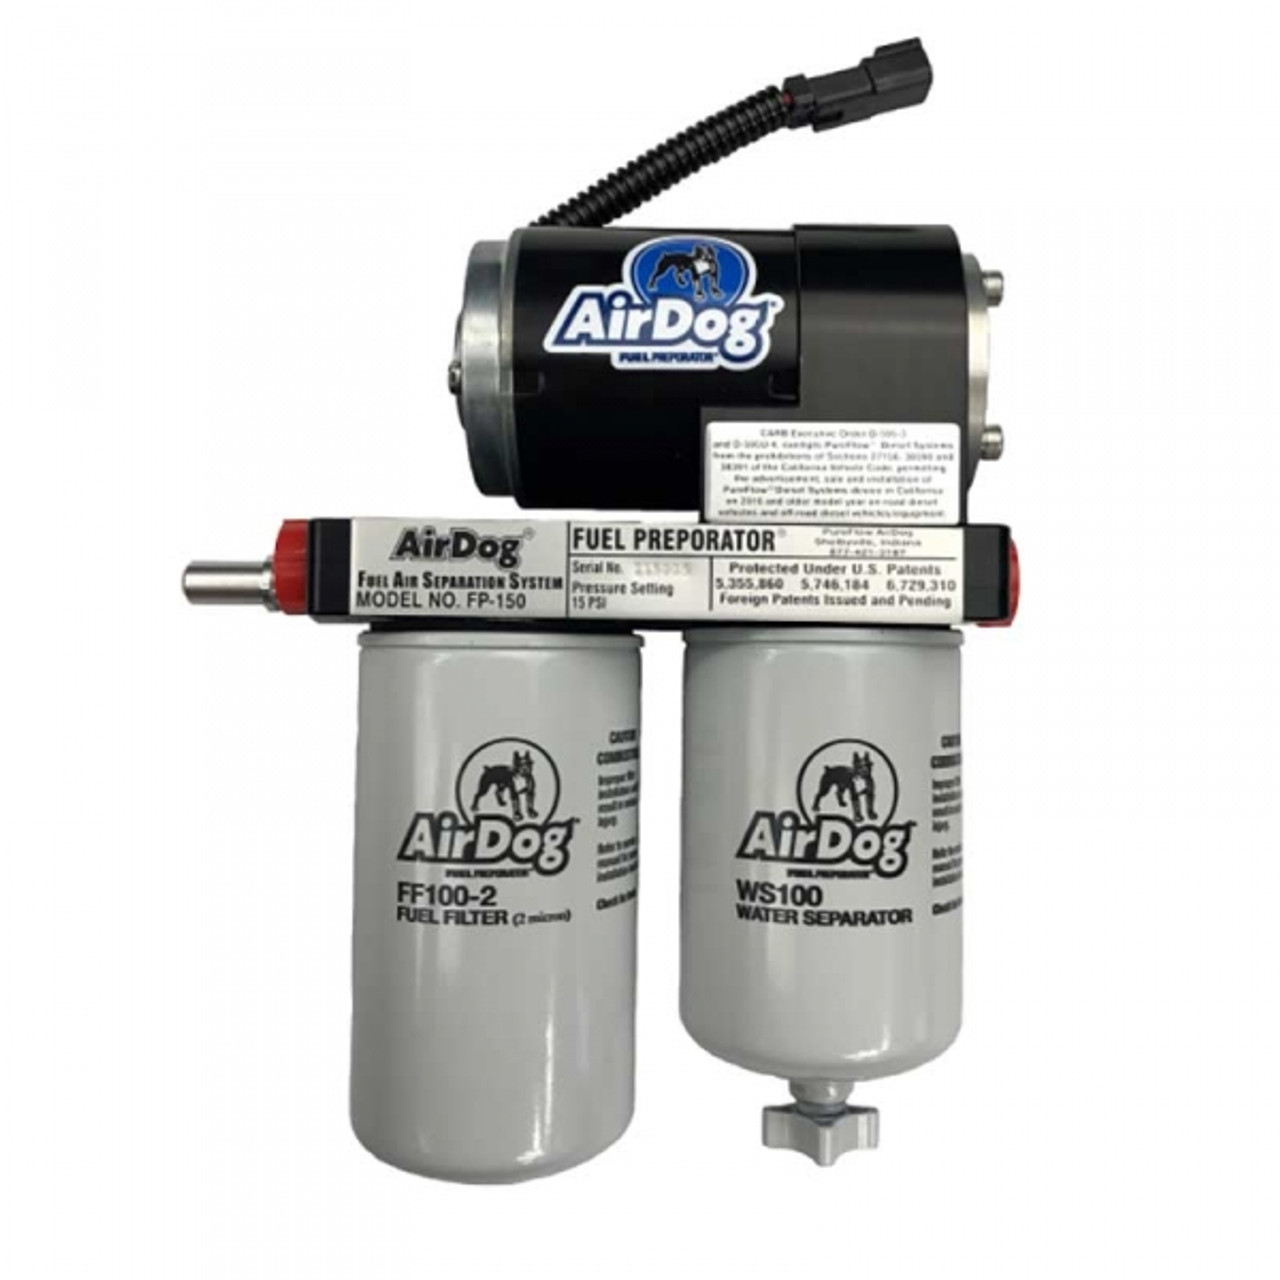 AirDog A4SPBC087 150GPH Air/Fuel Separation System